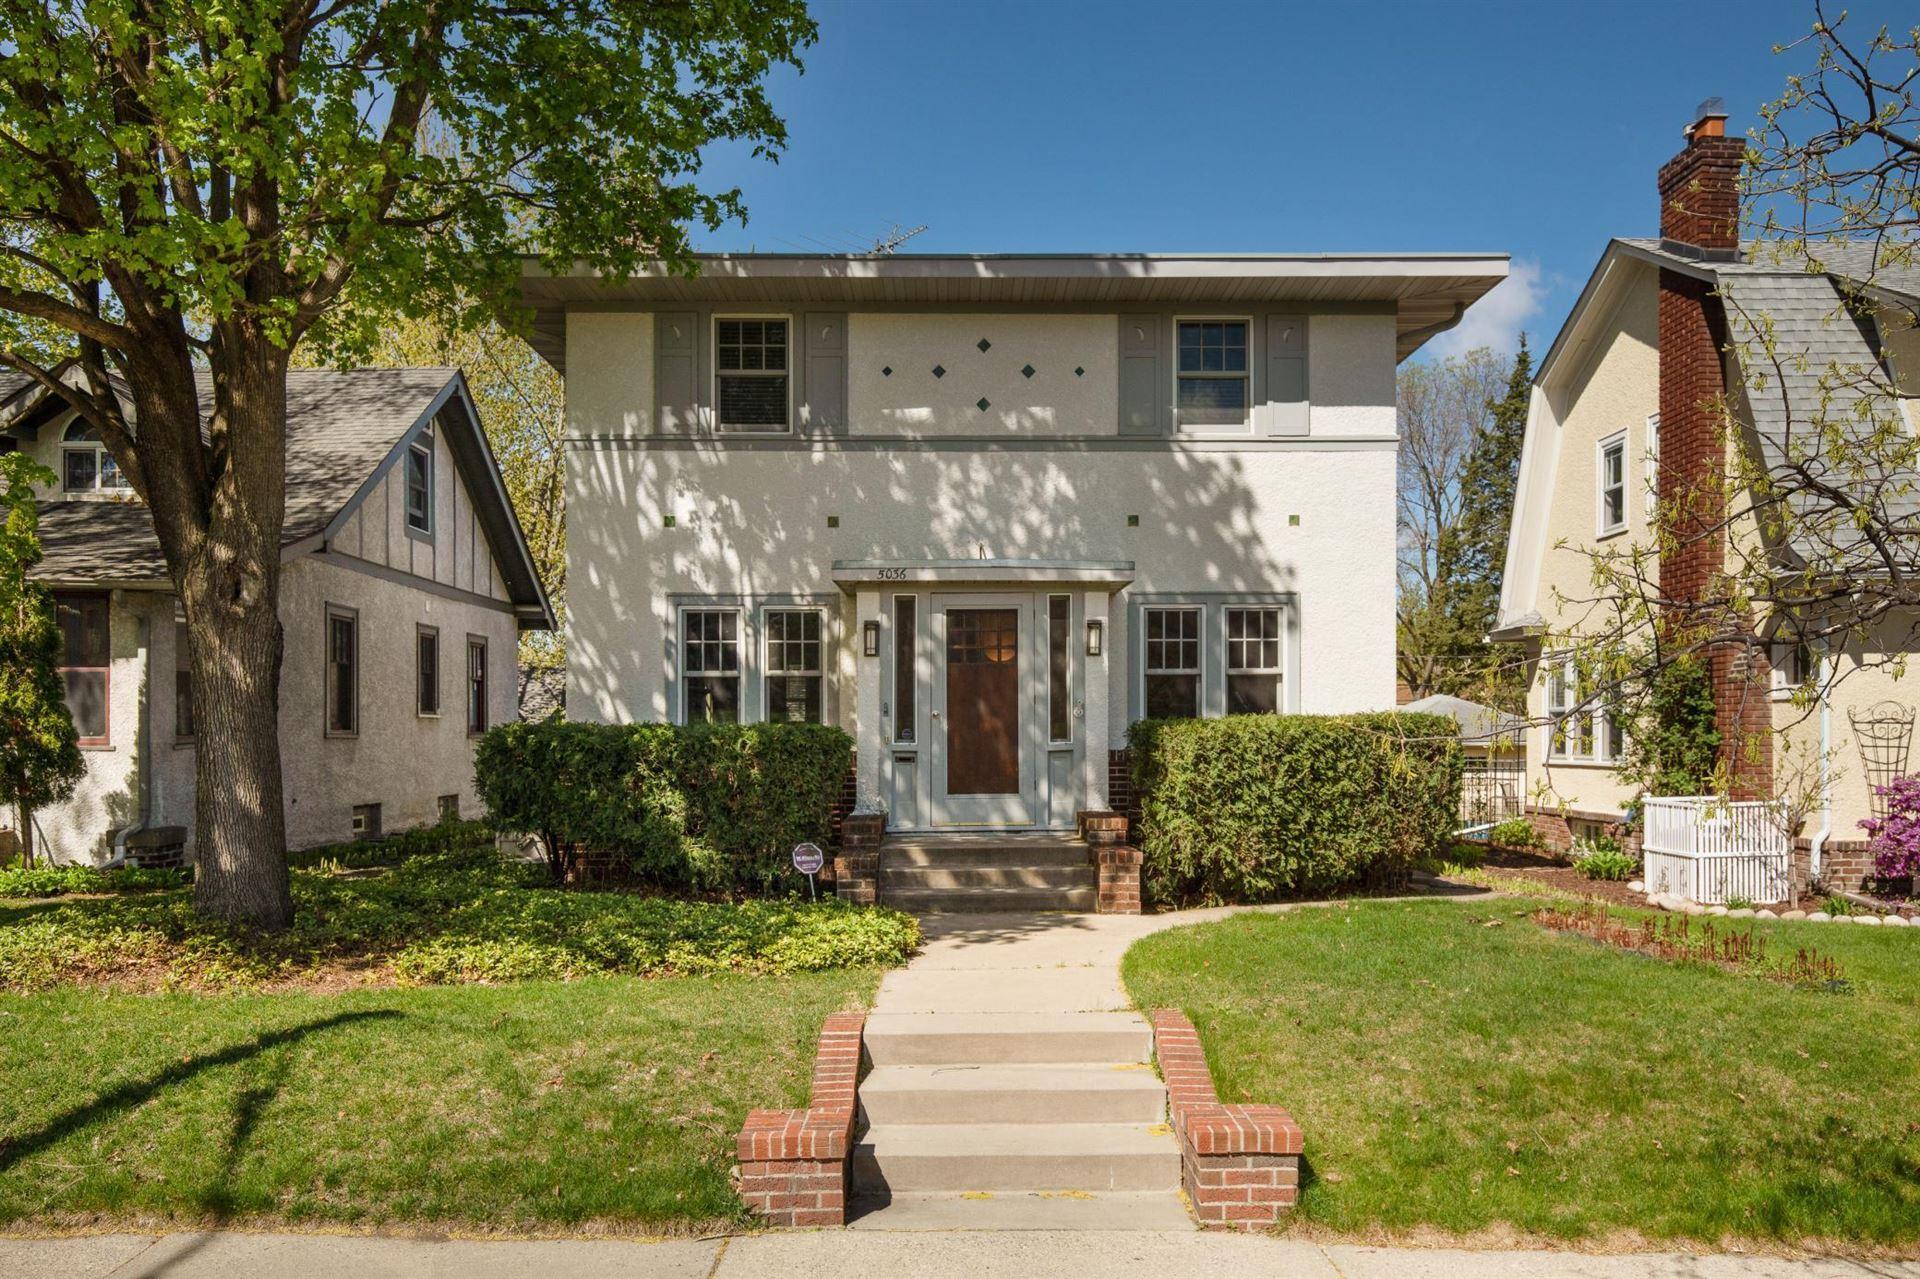 Photo of 5036 Oliver Avenue S, Minneapolis, MN 55419 (MLS # 5752206)